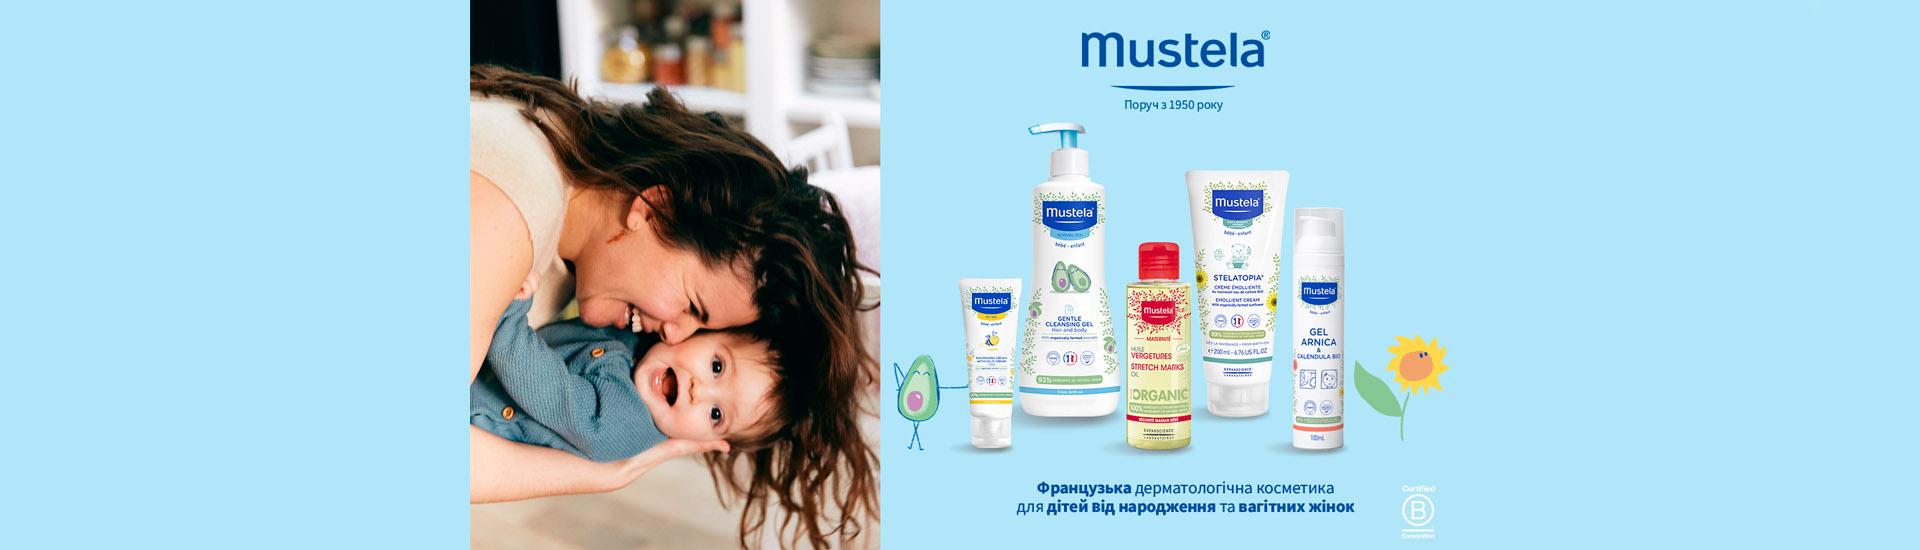 slider1-home1-mustella